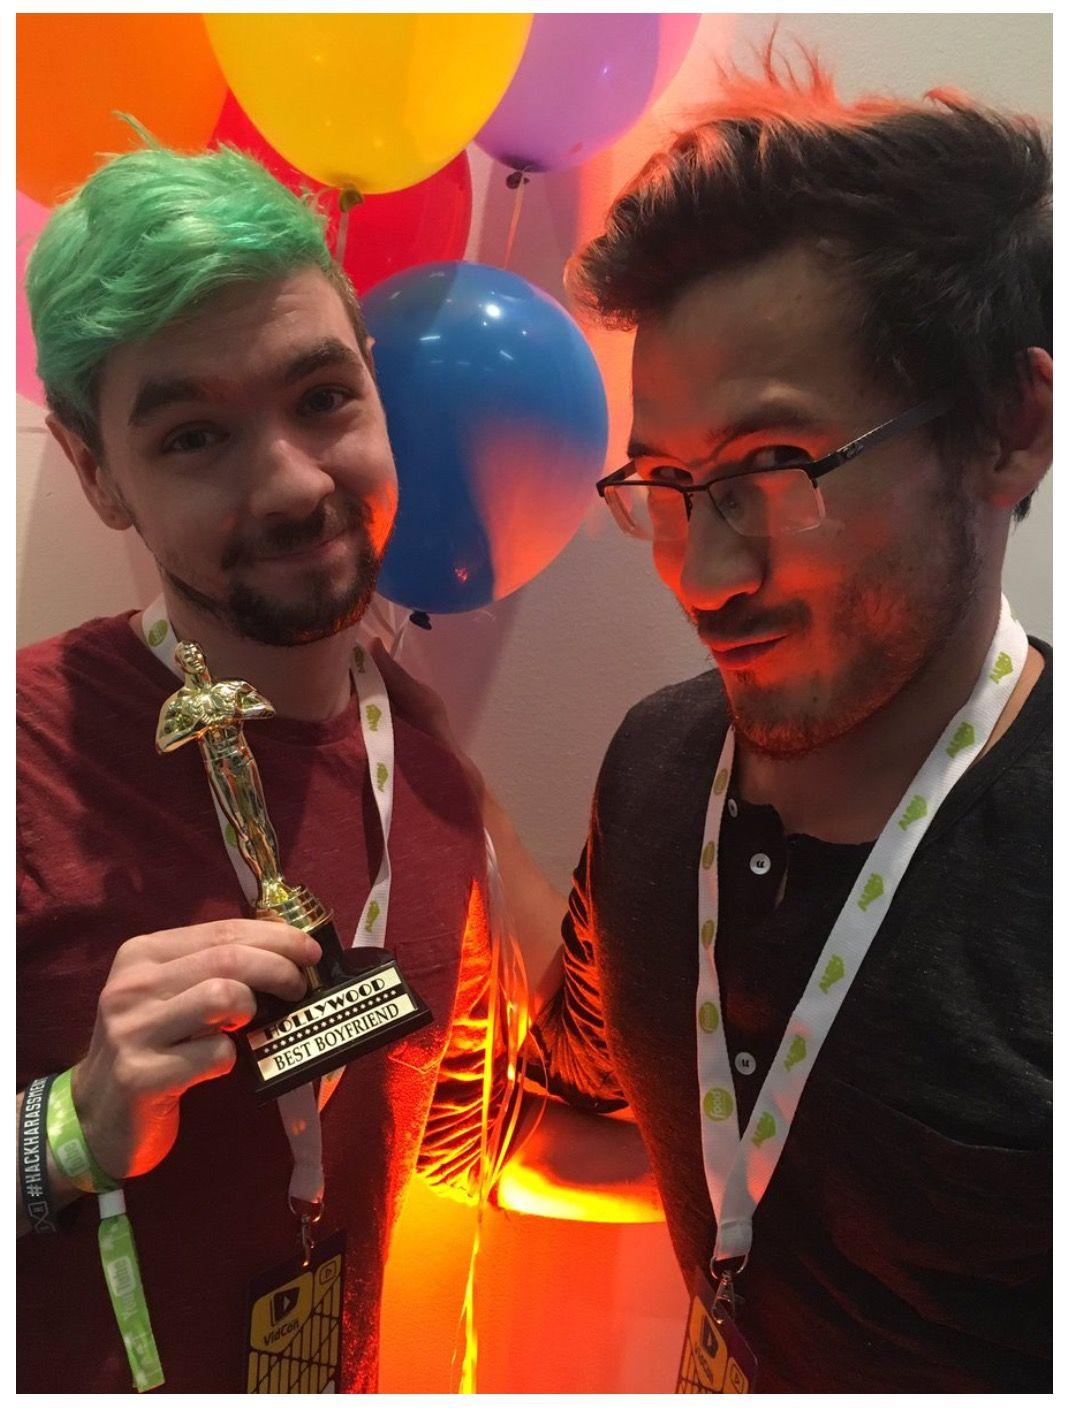 #Markiplier and #jacksepticeye  Awww jack won an award for best boyfriend at vidcon 2016 lol